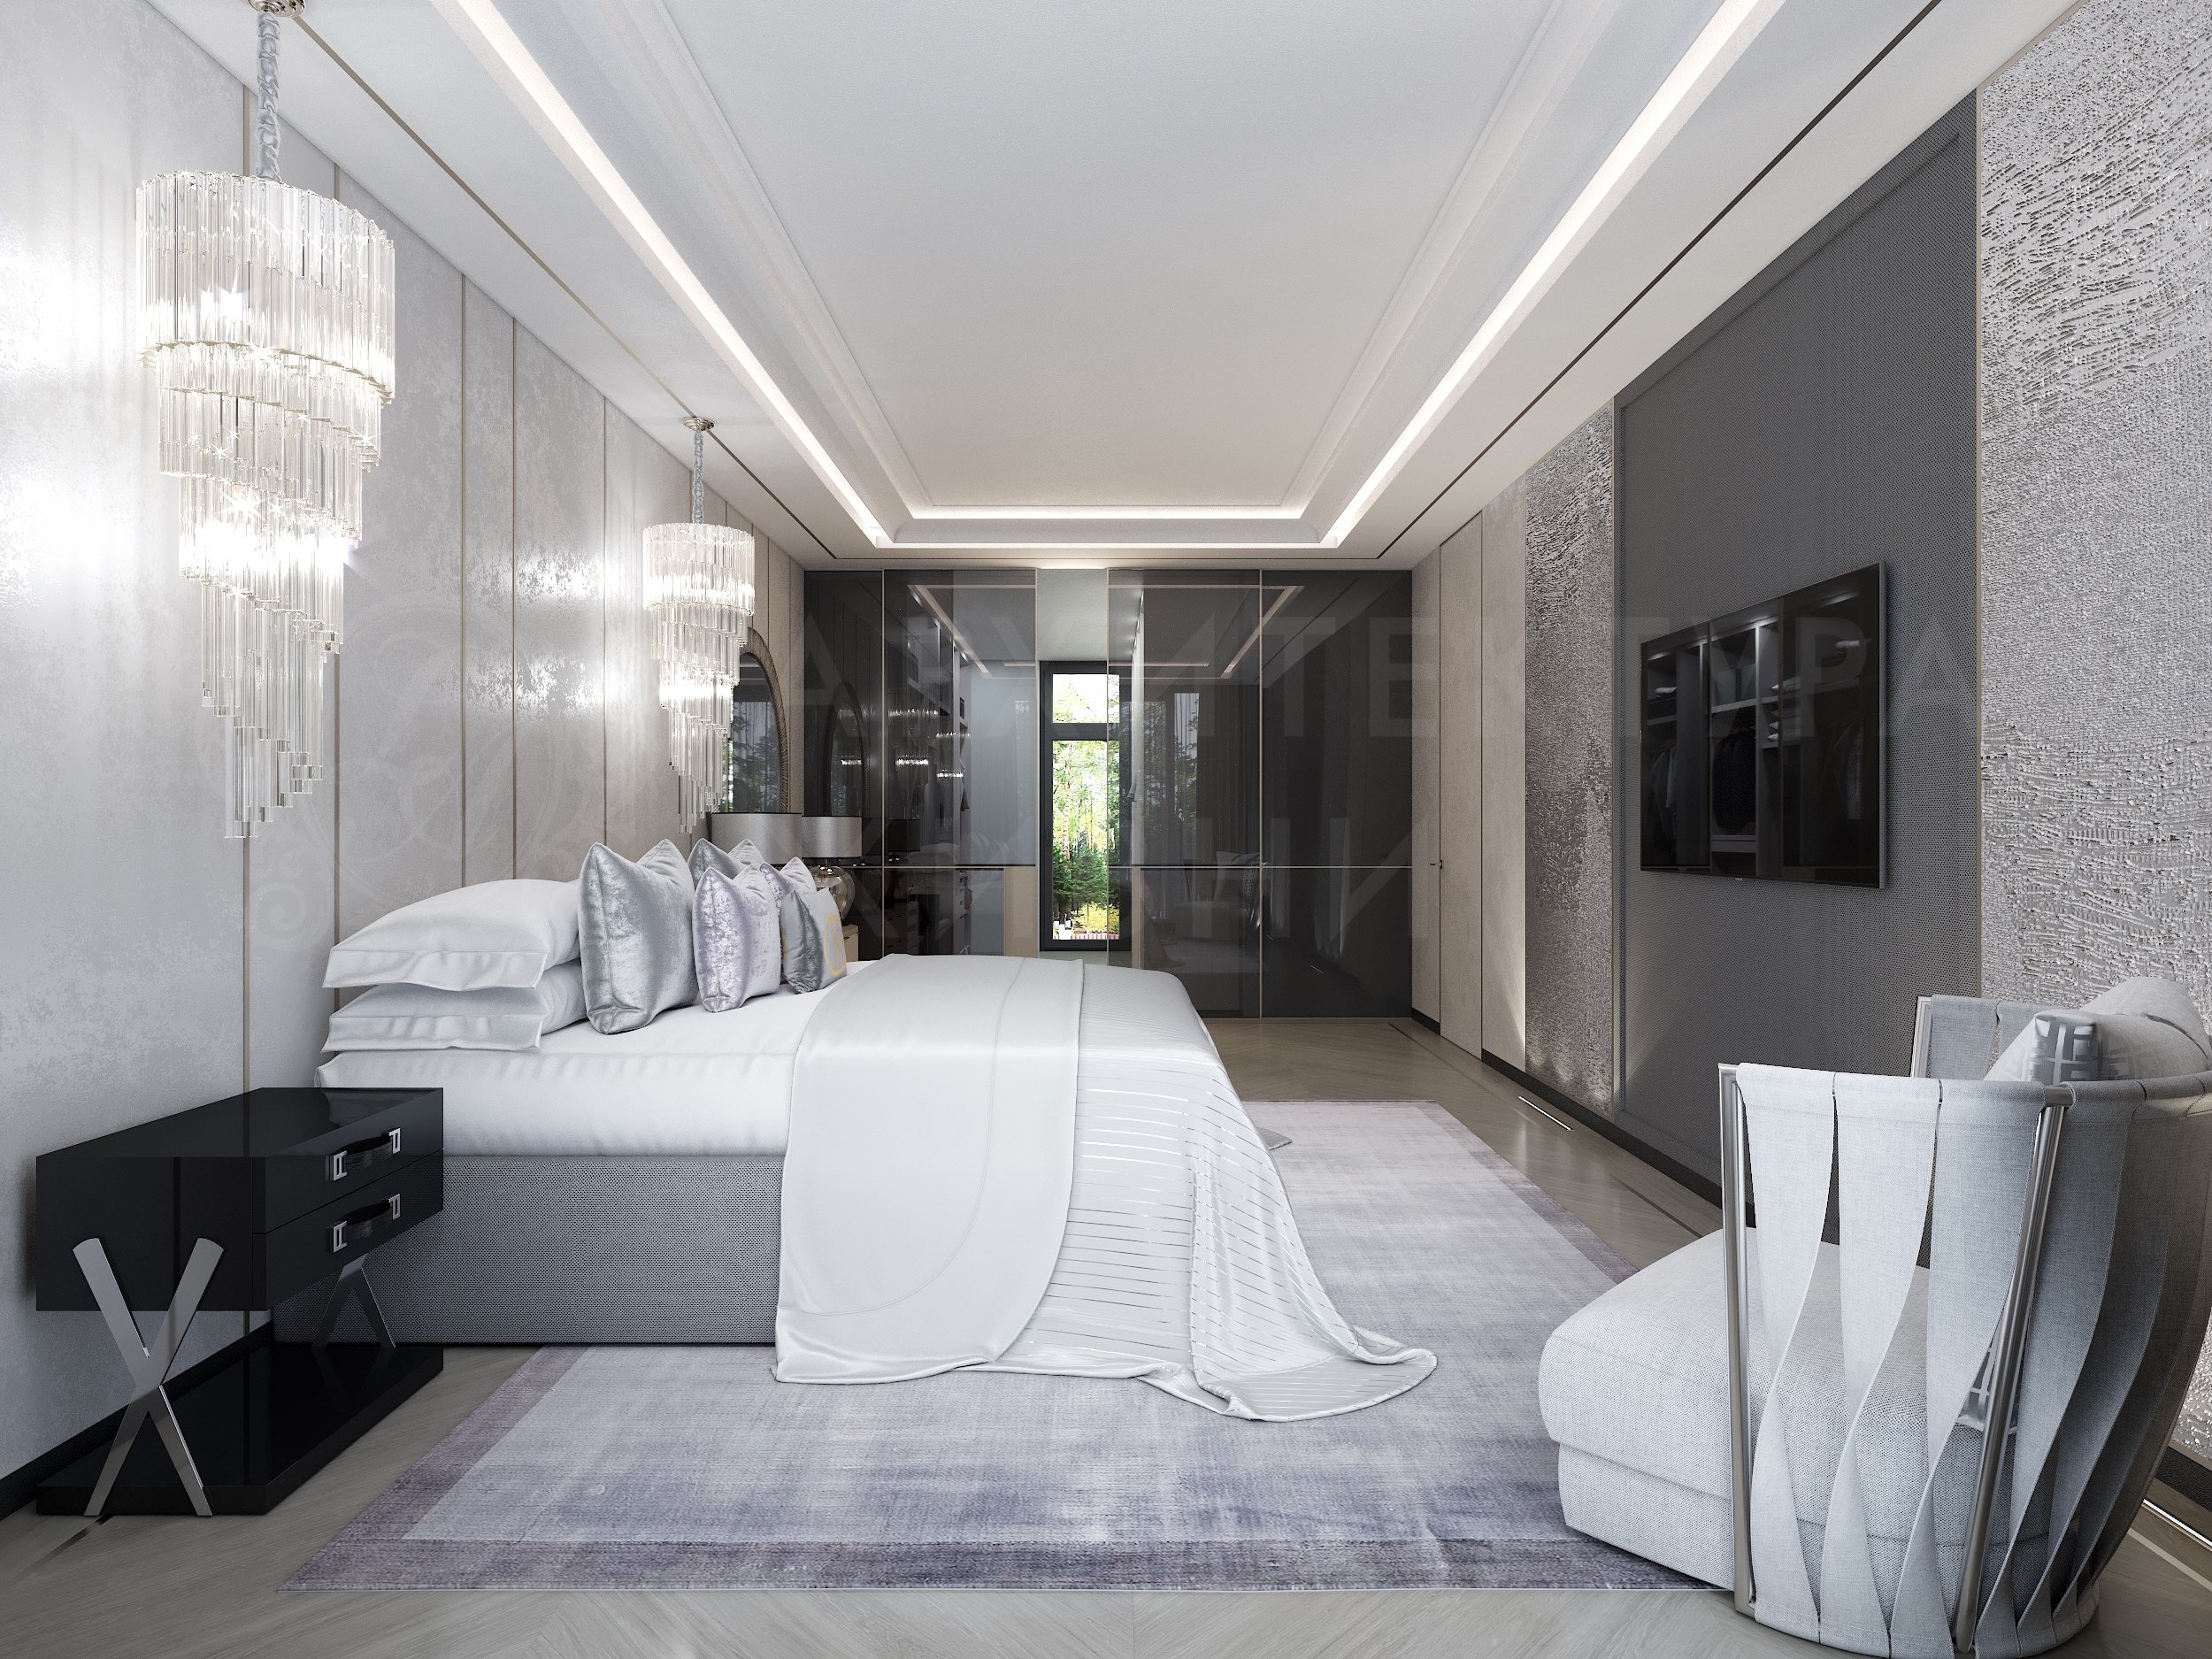 BedroomVid2.jpg